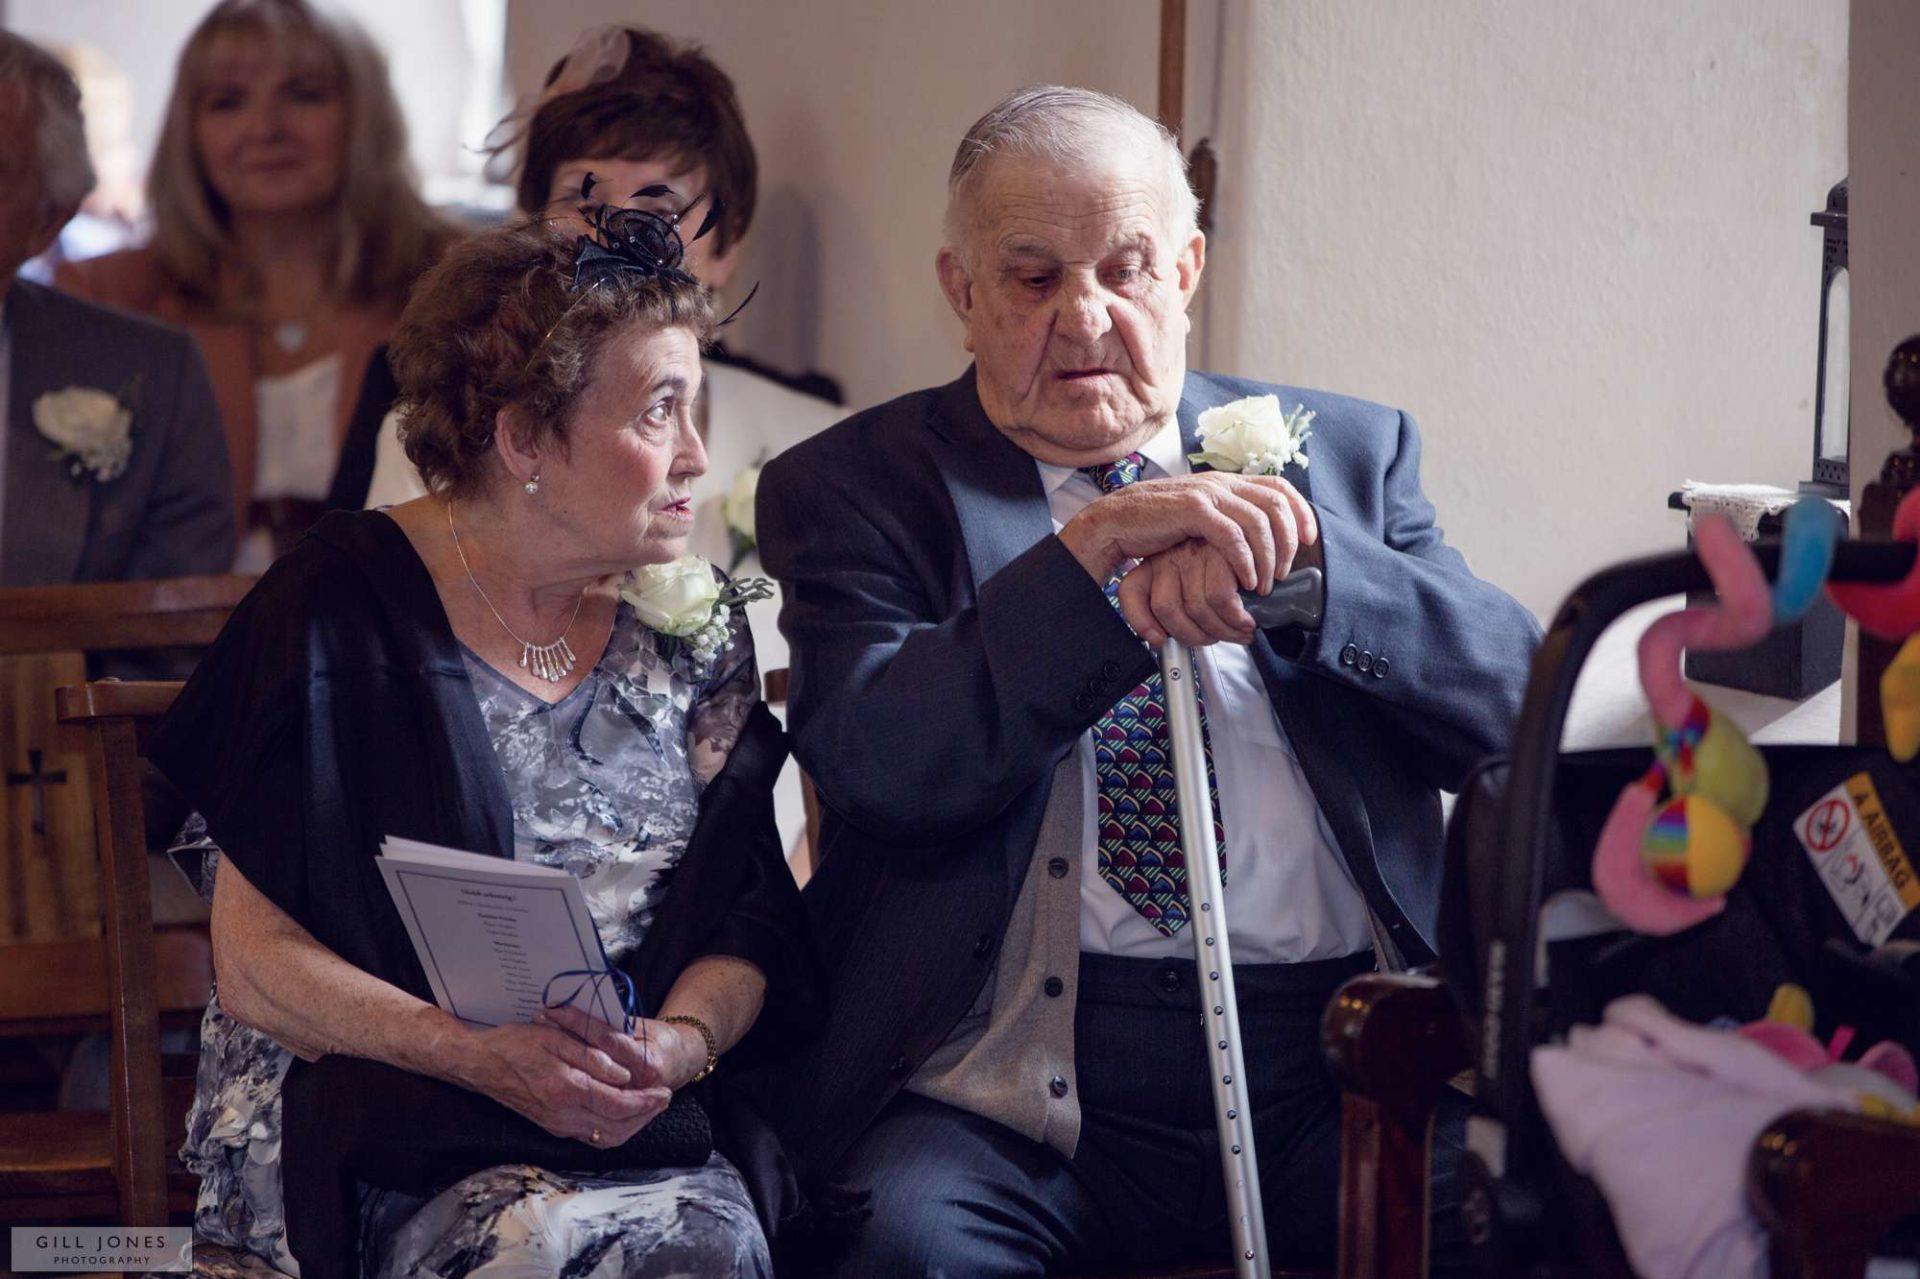 elderly guests in church